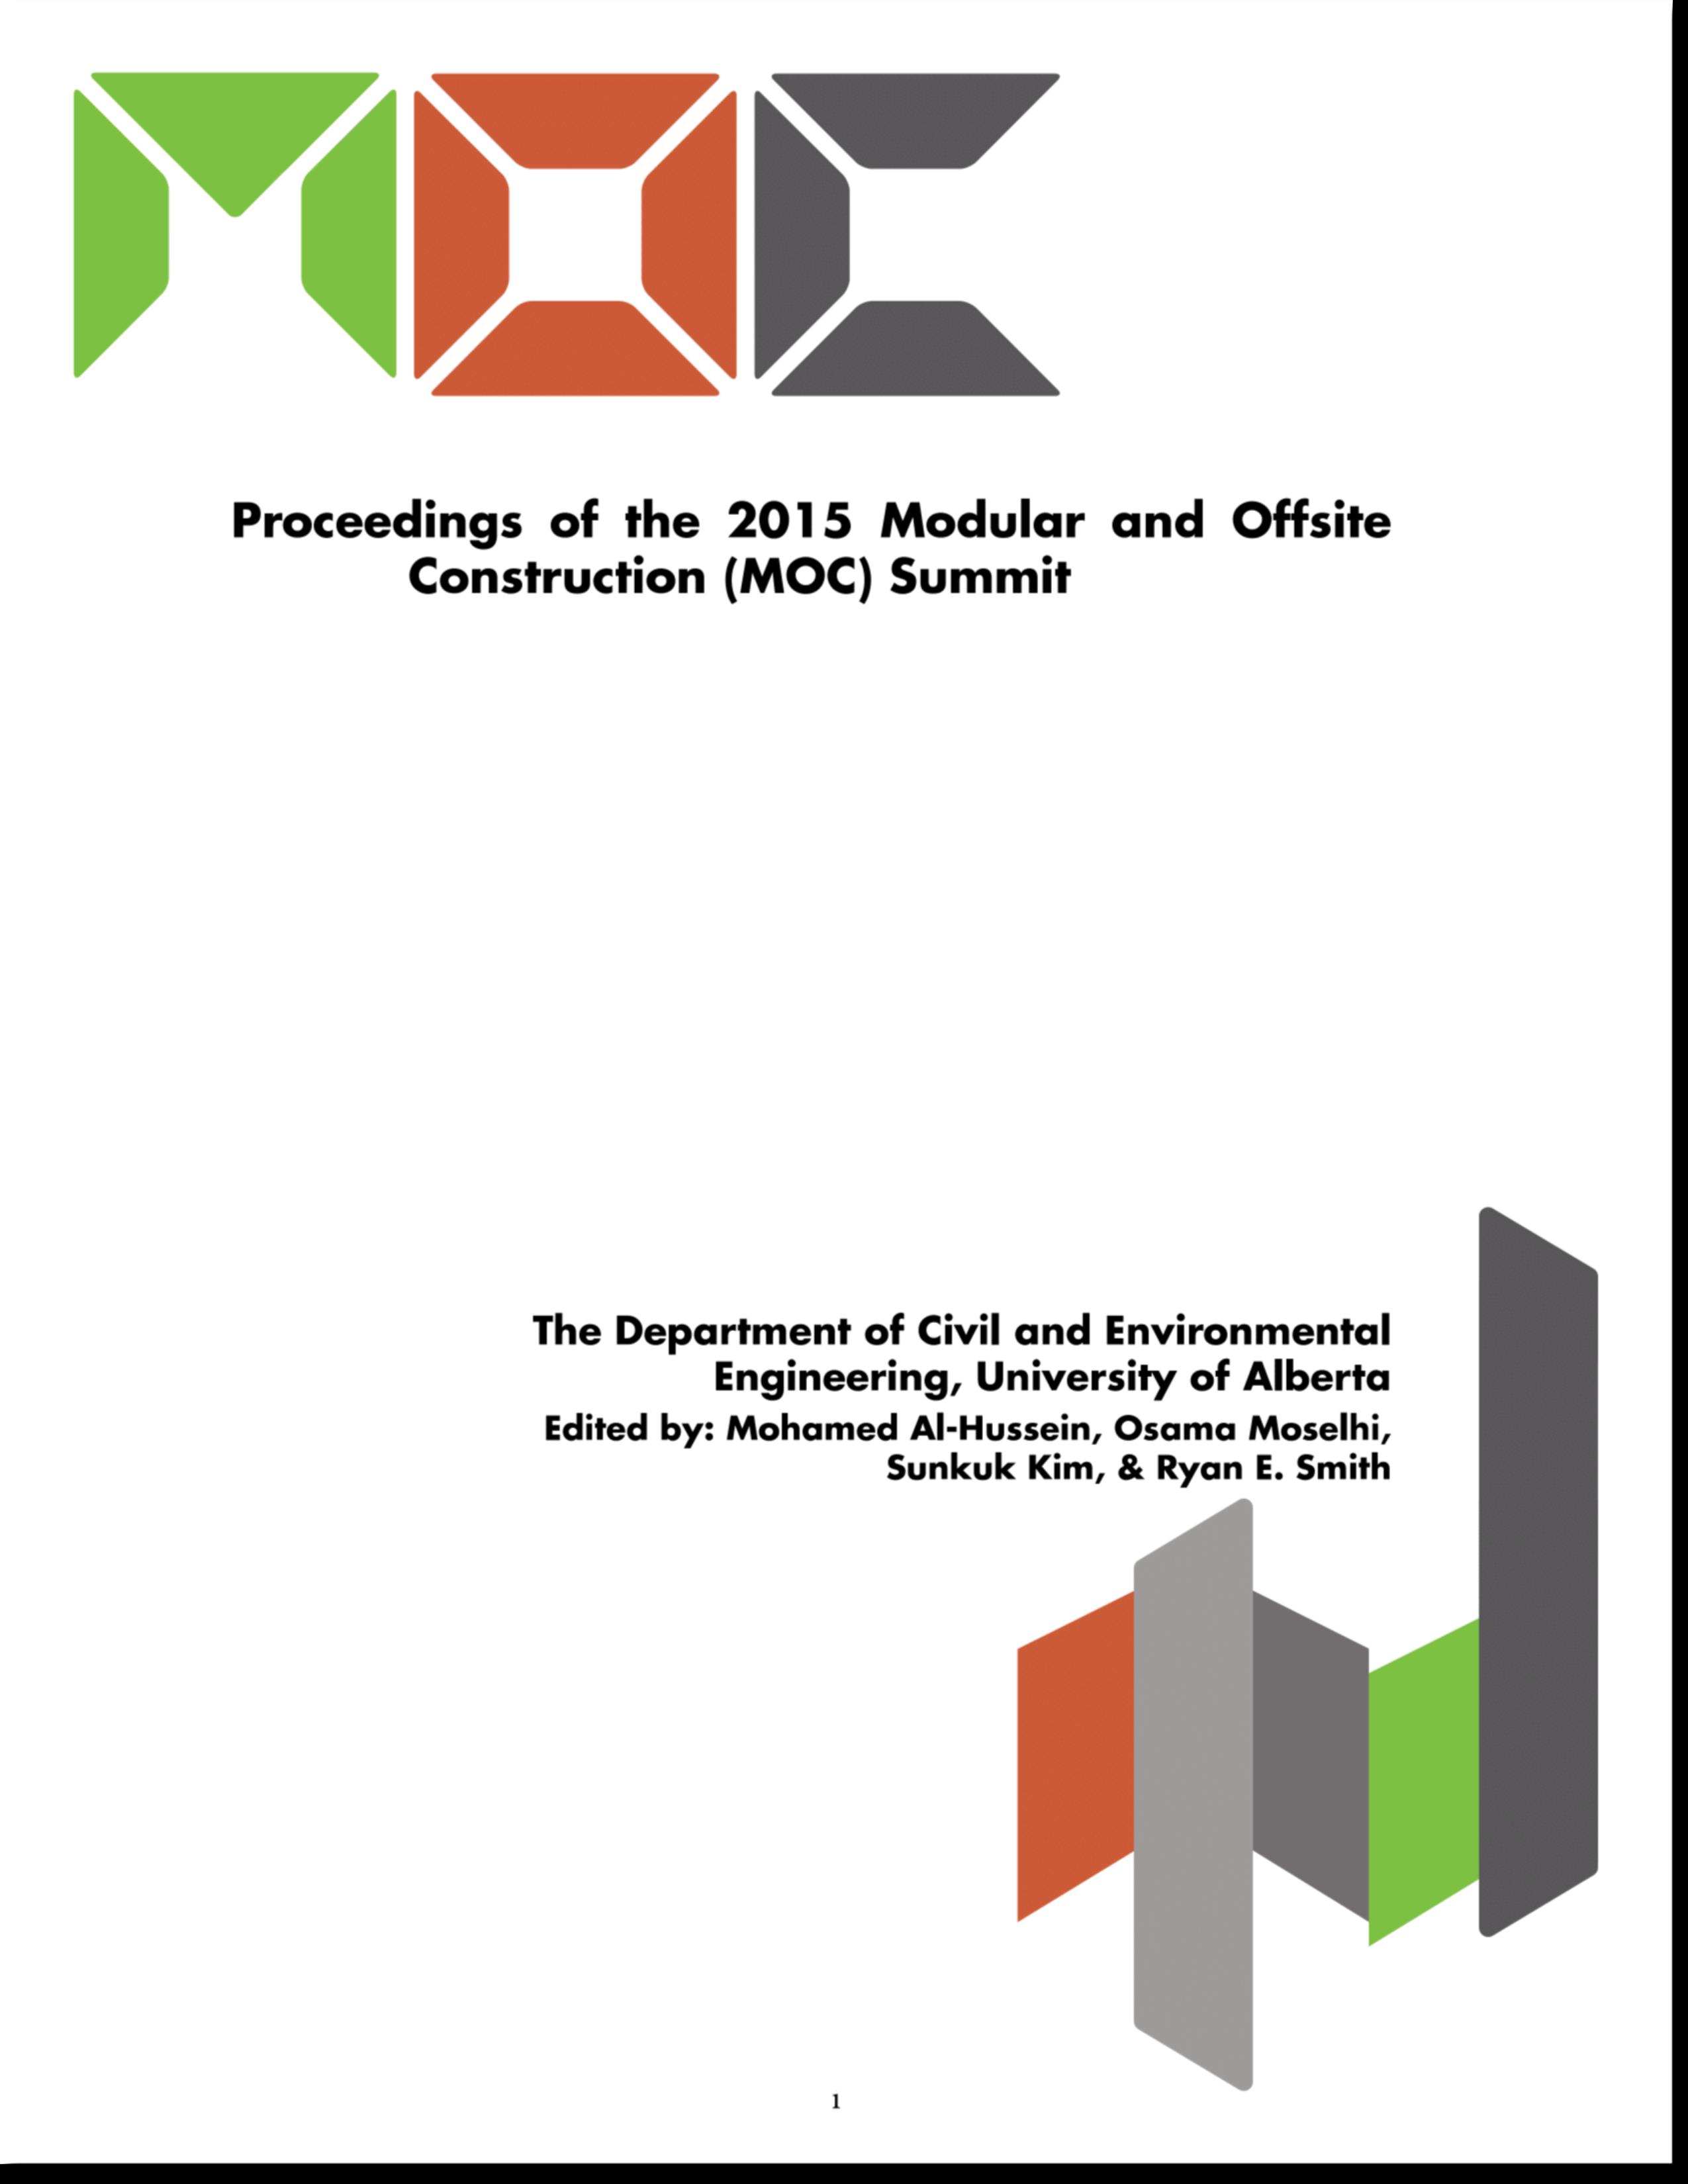 2015 MOC Summit conference proceedings